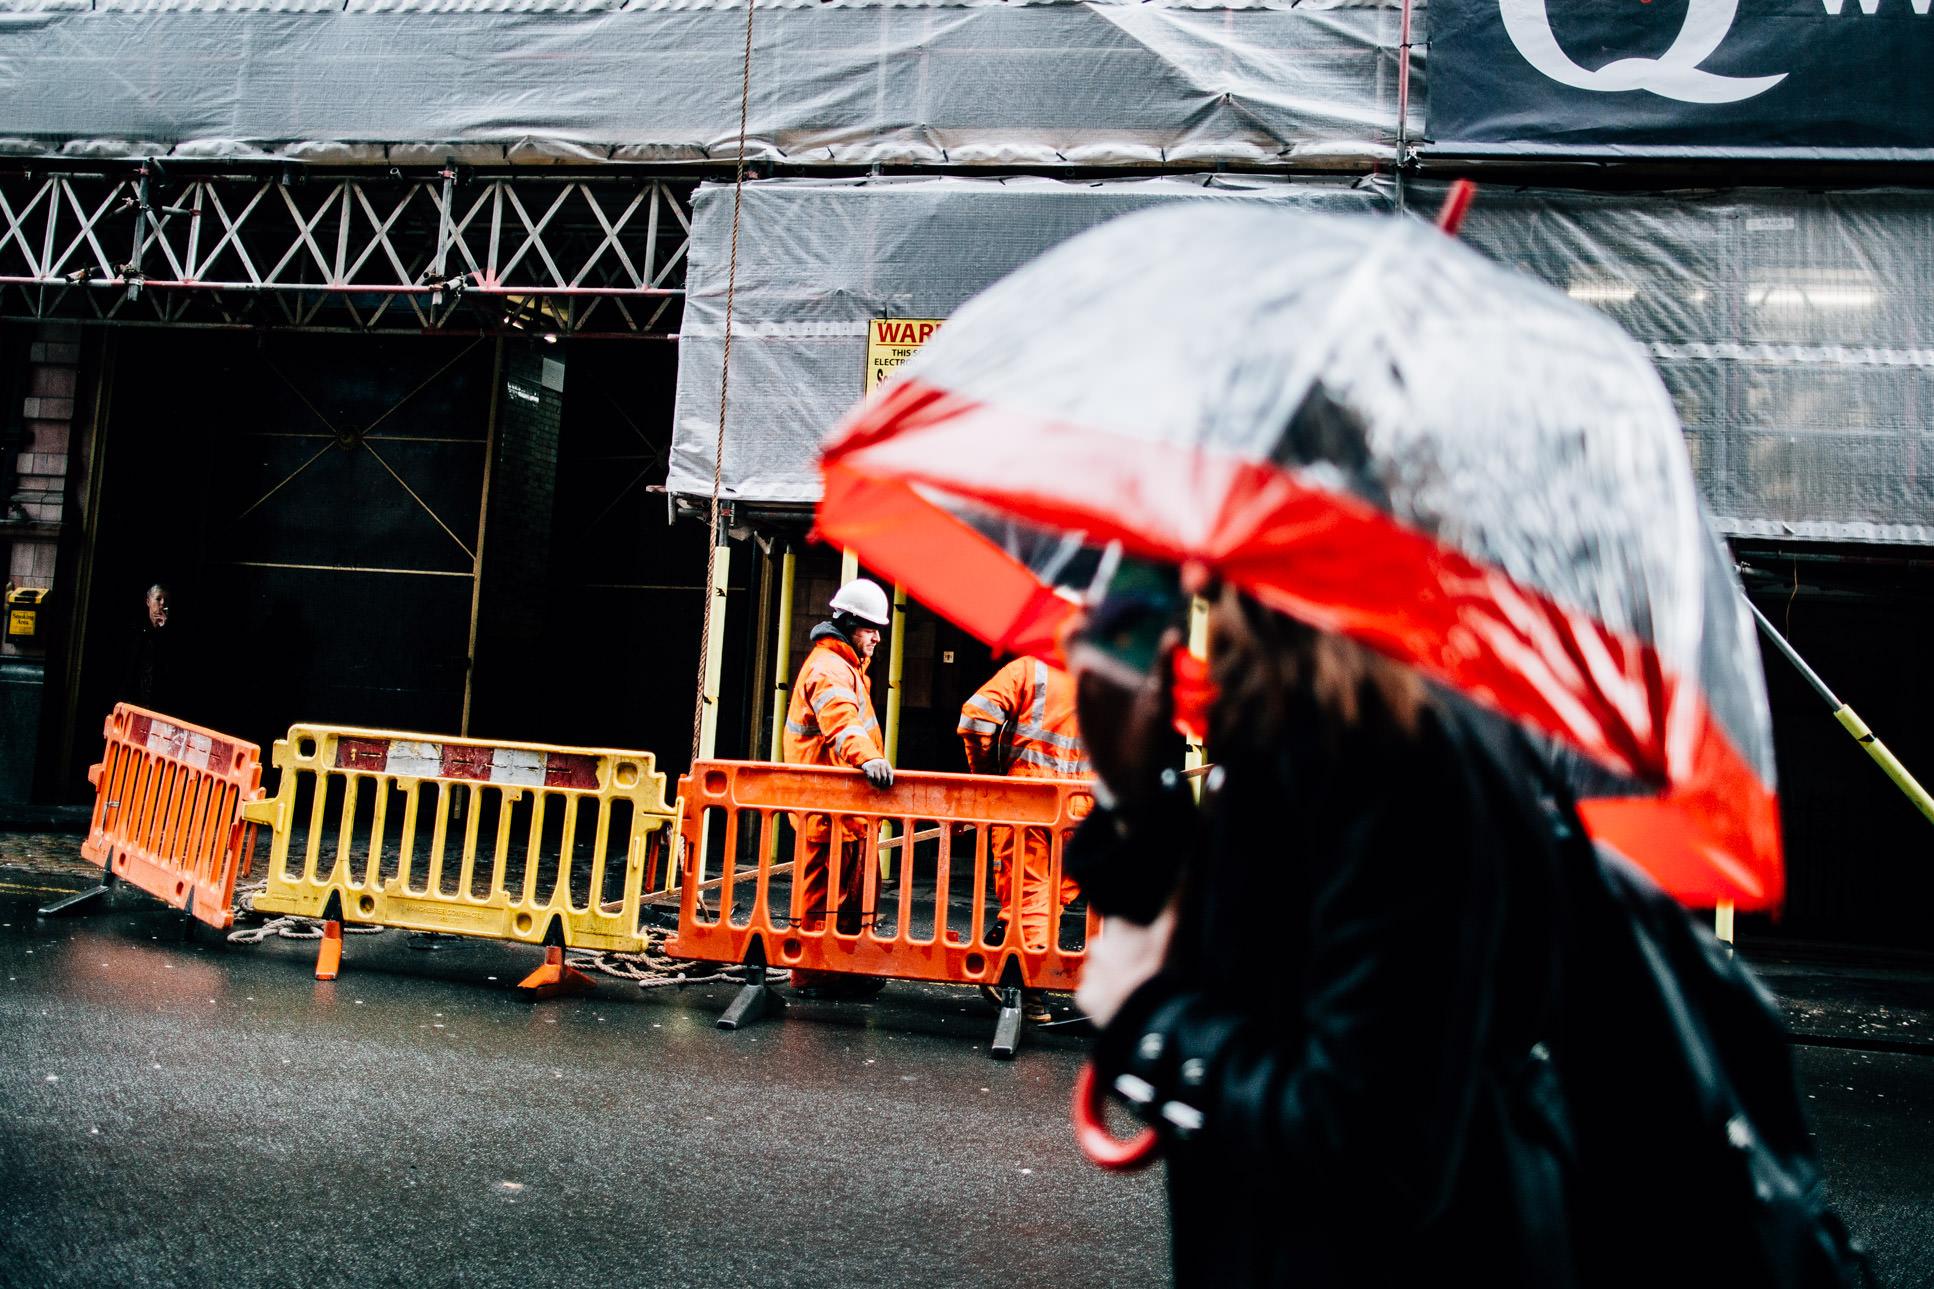 Street Photography22